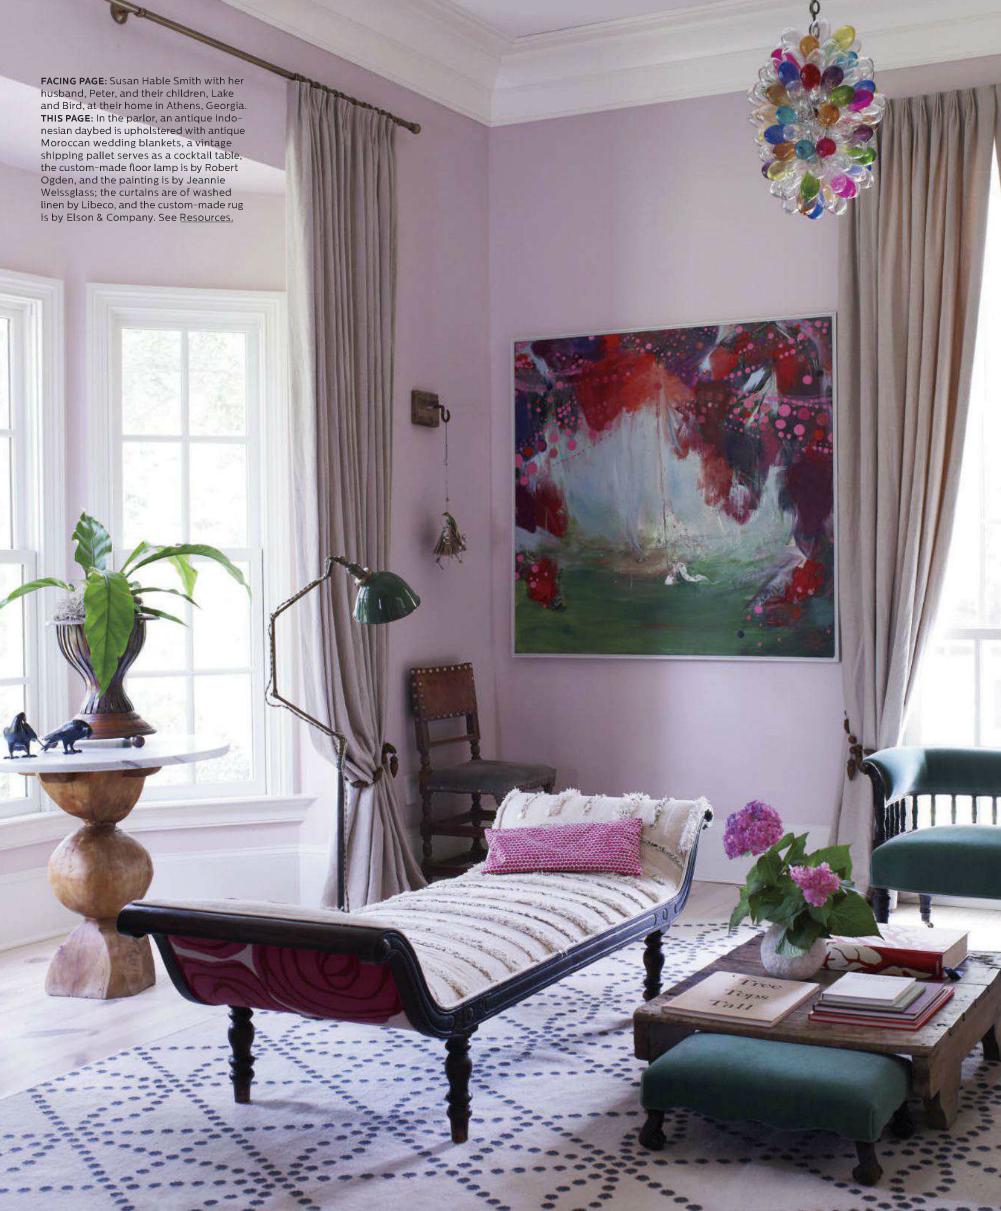 Elle Decor May 2013 Susan Hable Smith inspiring interiors